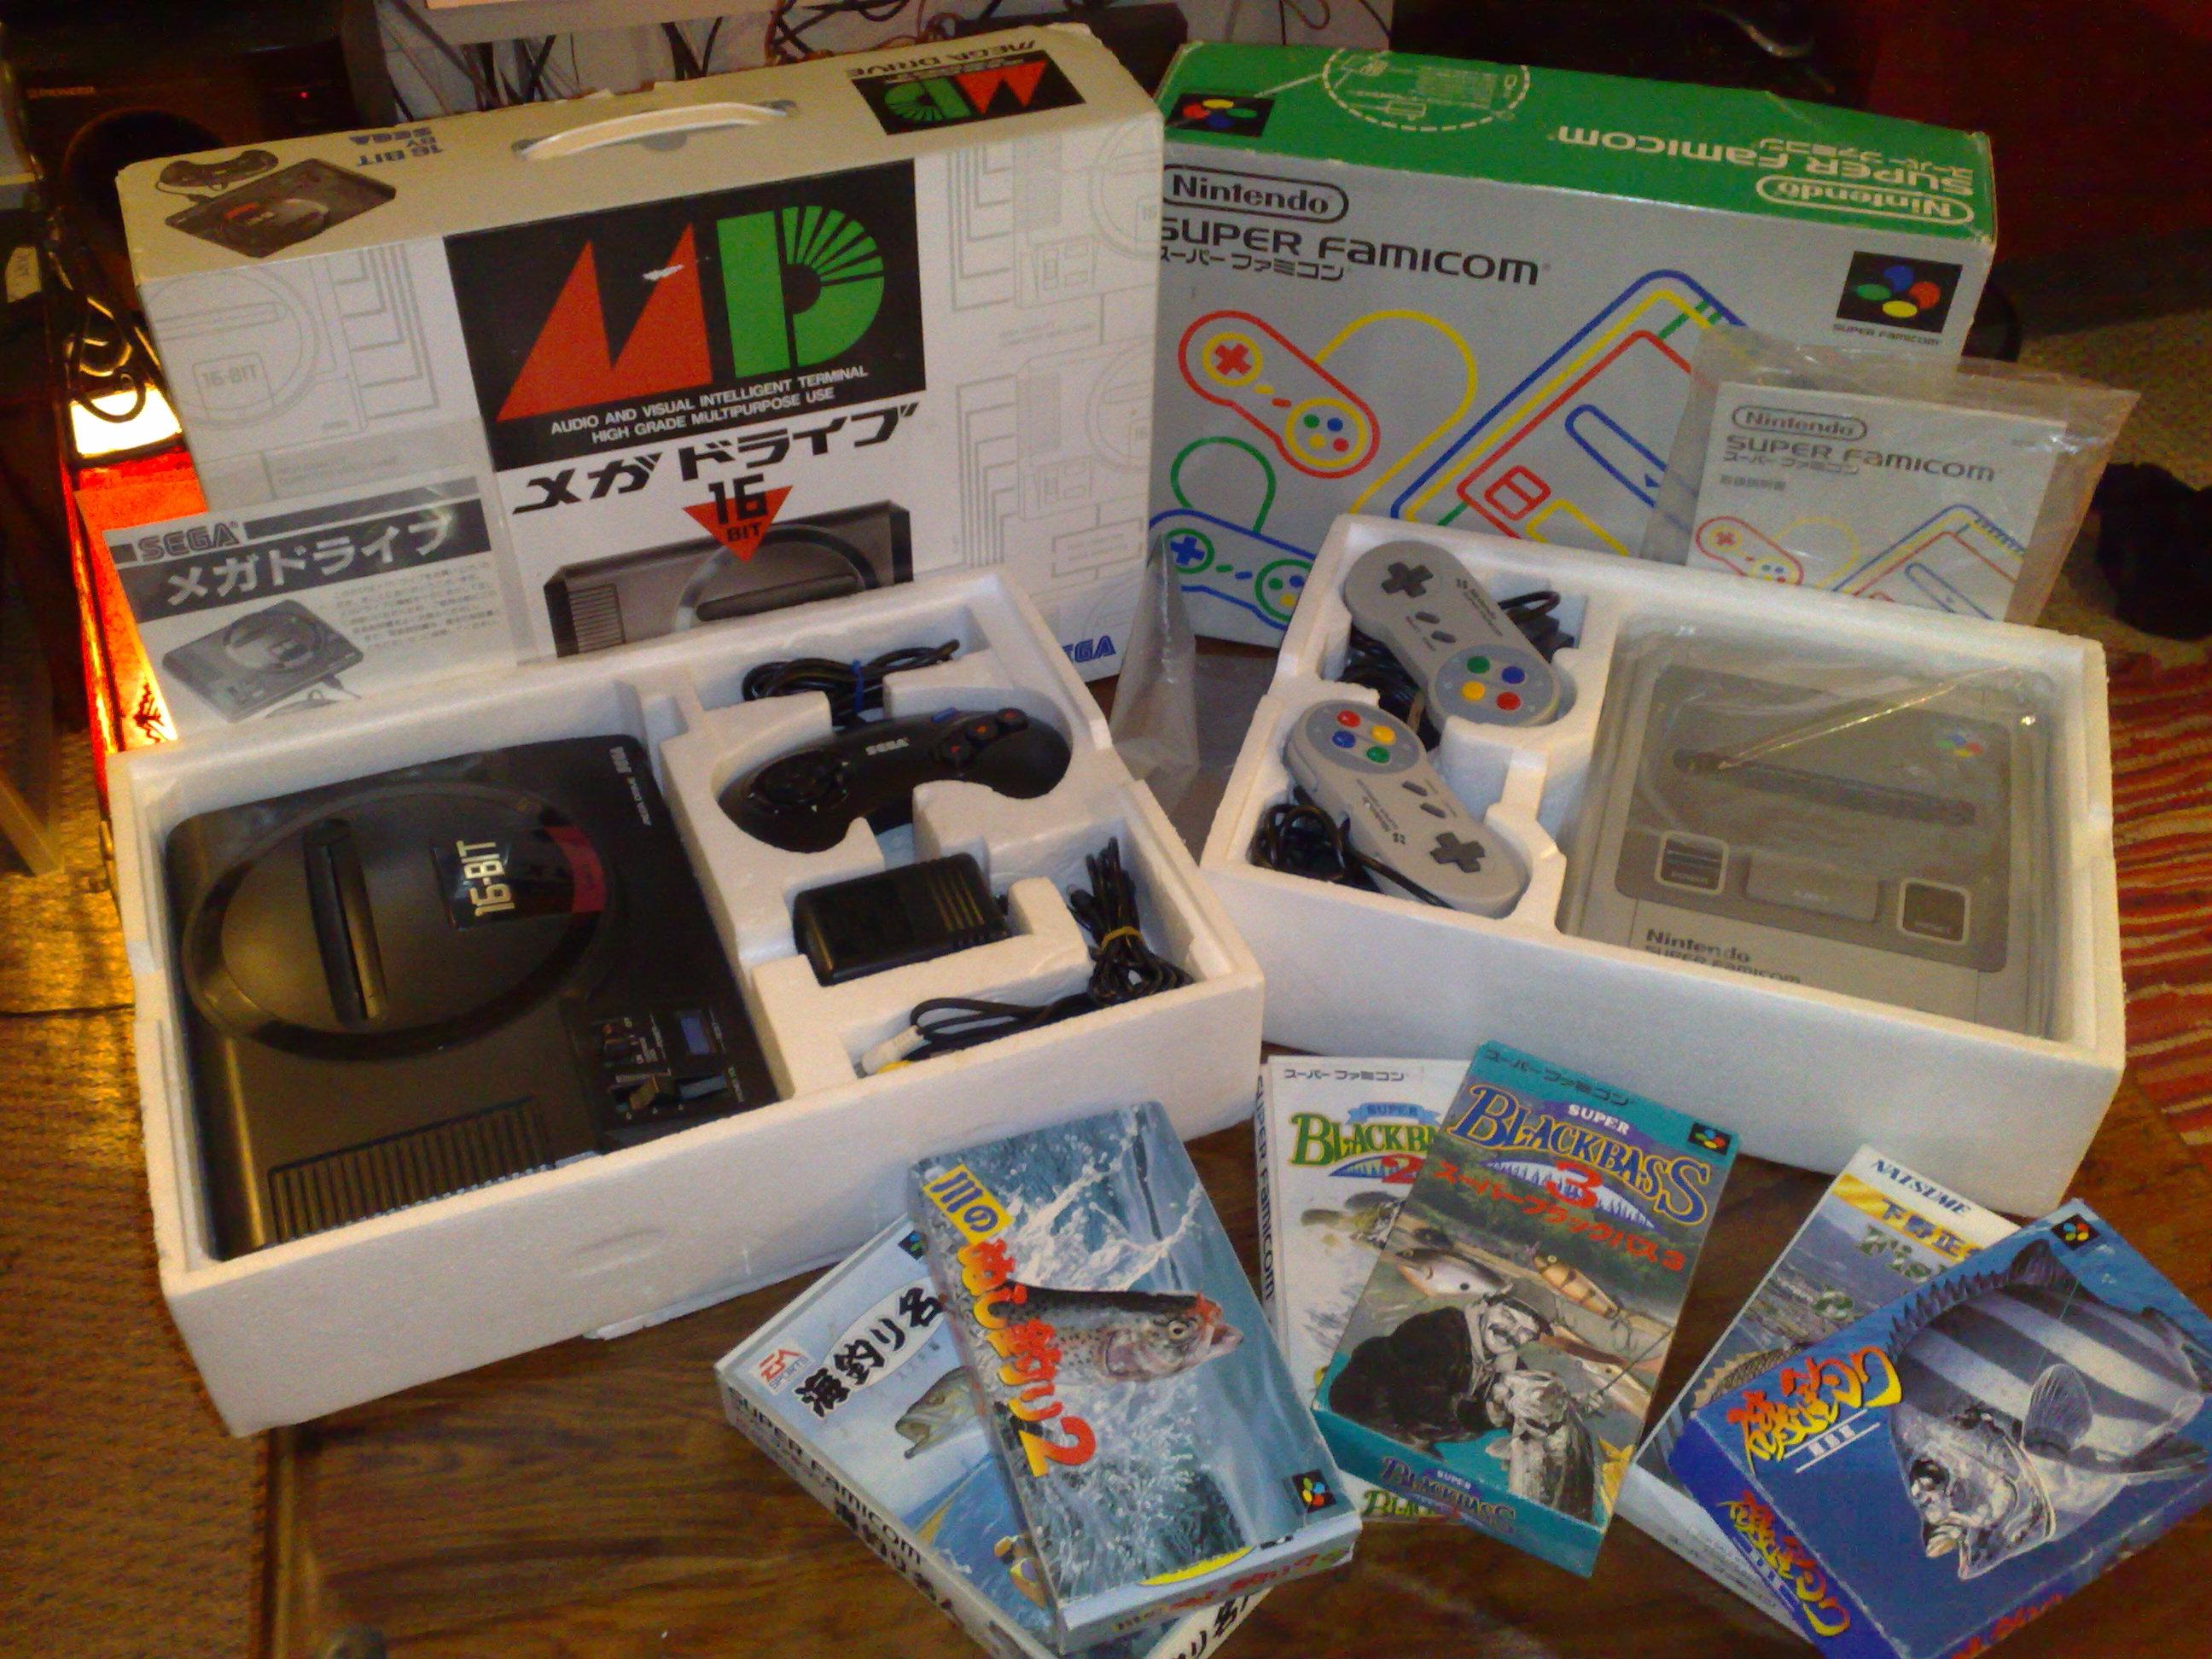 http://wda-fr.org/pict/acqui/Consoles/YB-140609-03.jpg